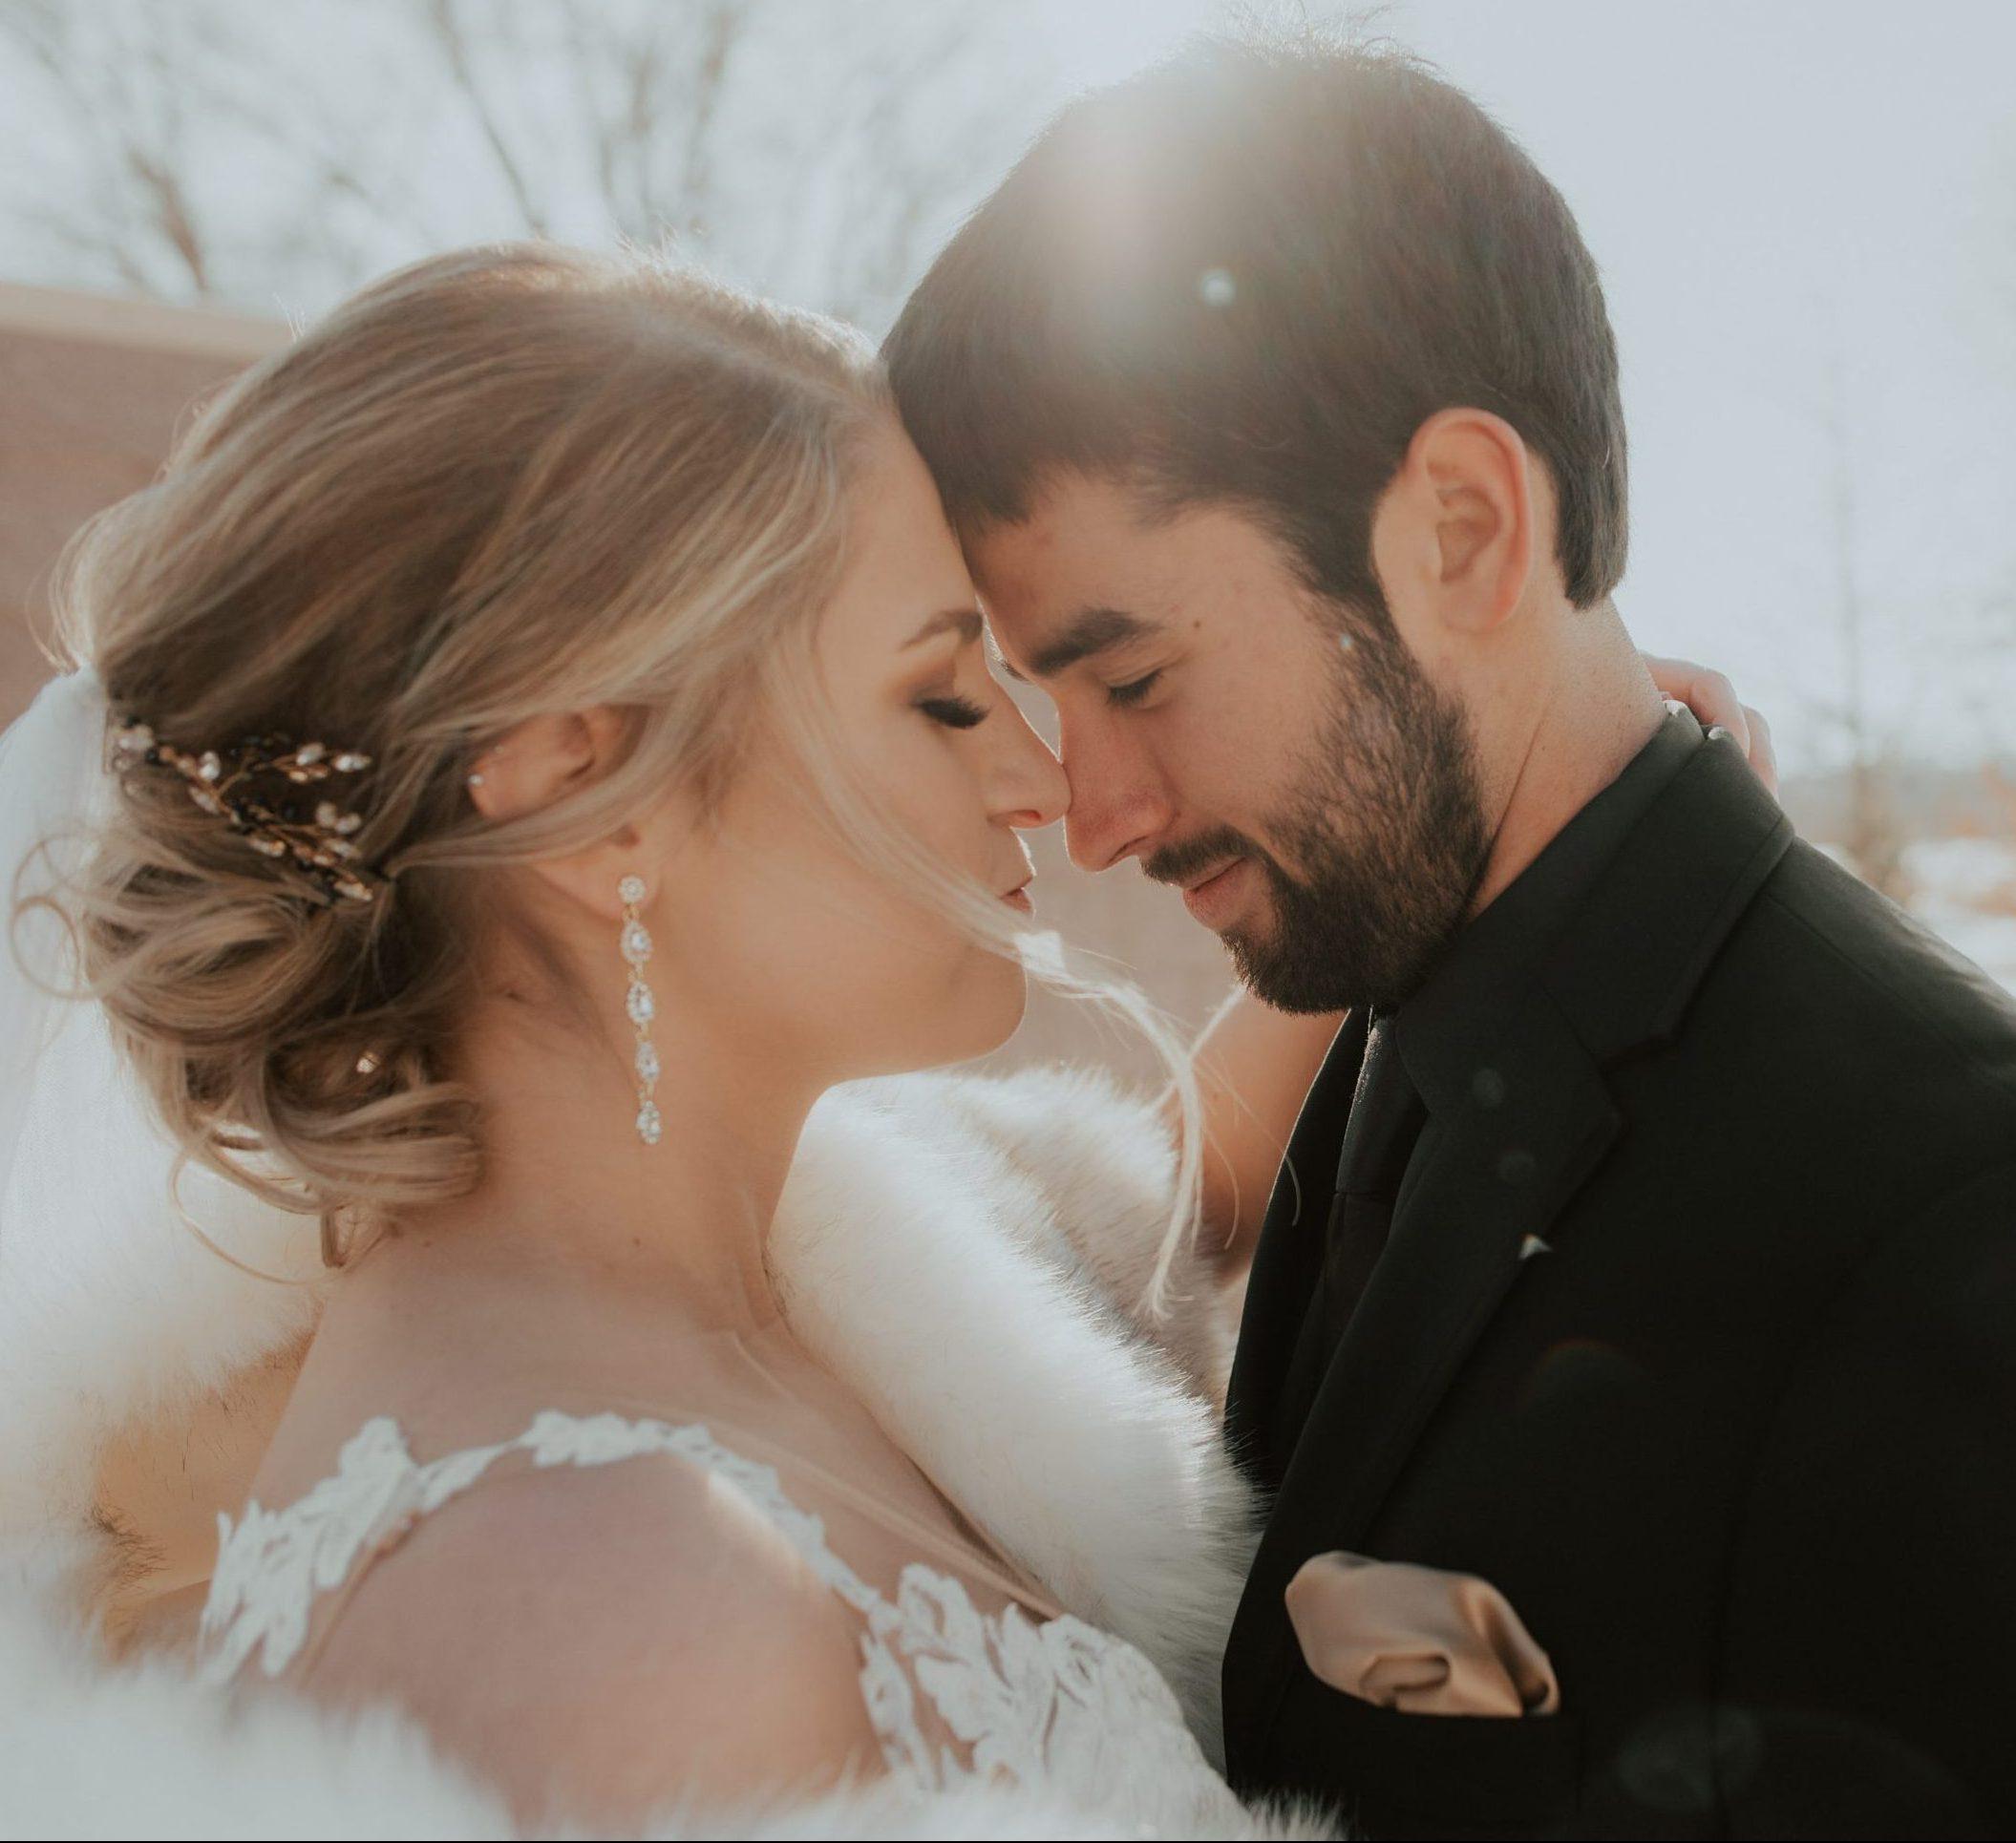 morgan zach omaha nebraska wedding midwest photographer winter snowy wedding